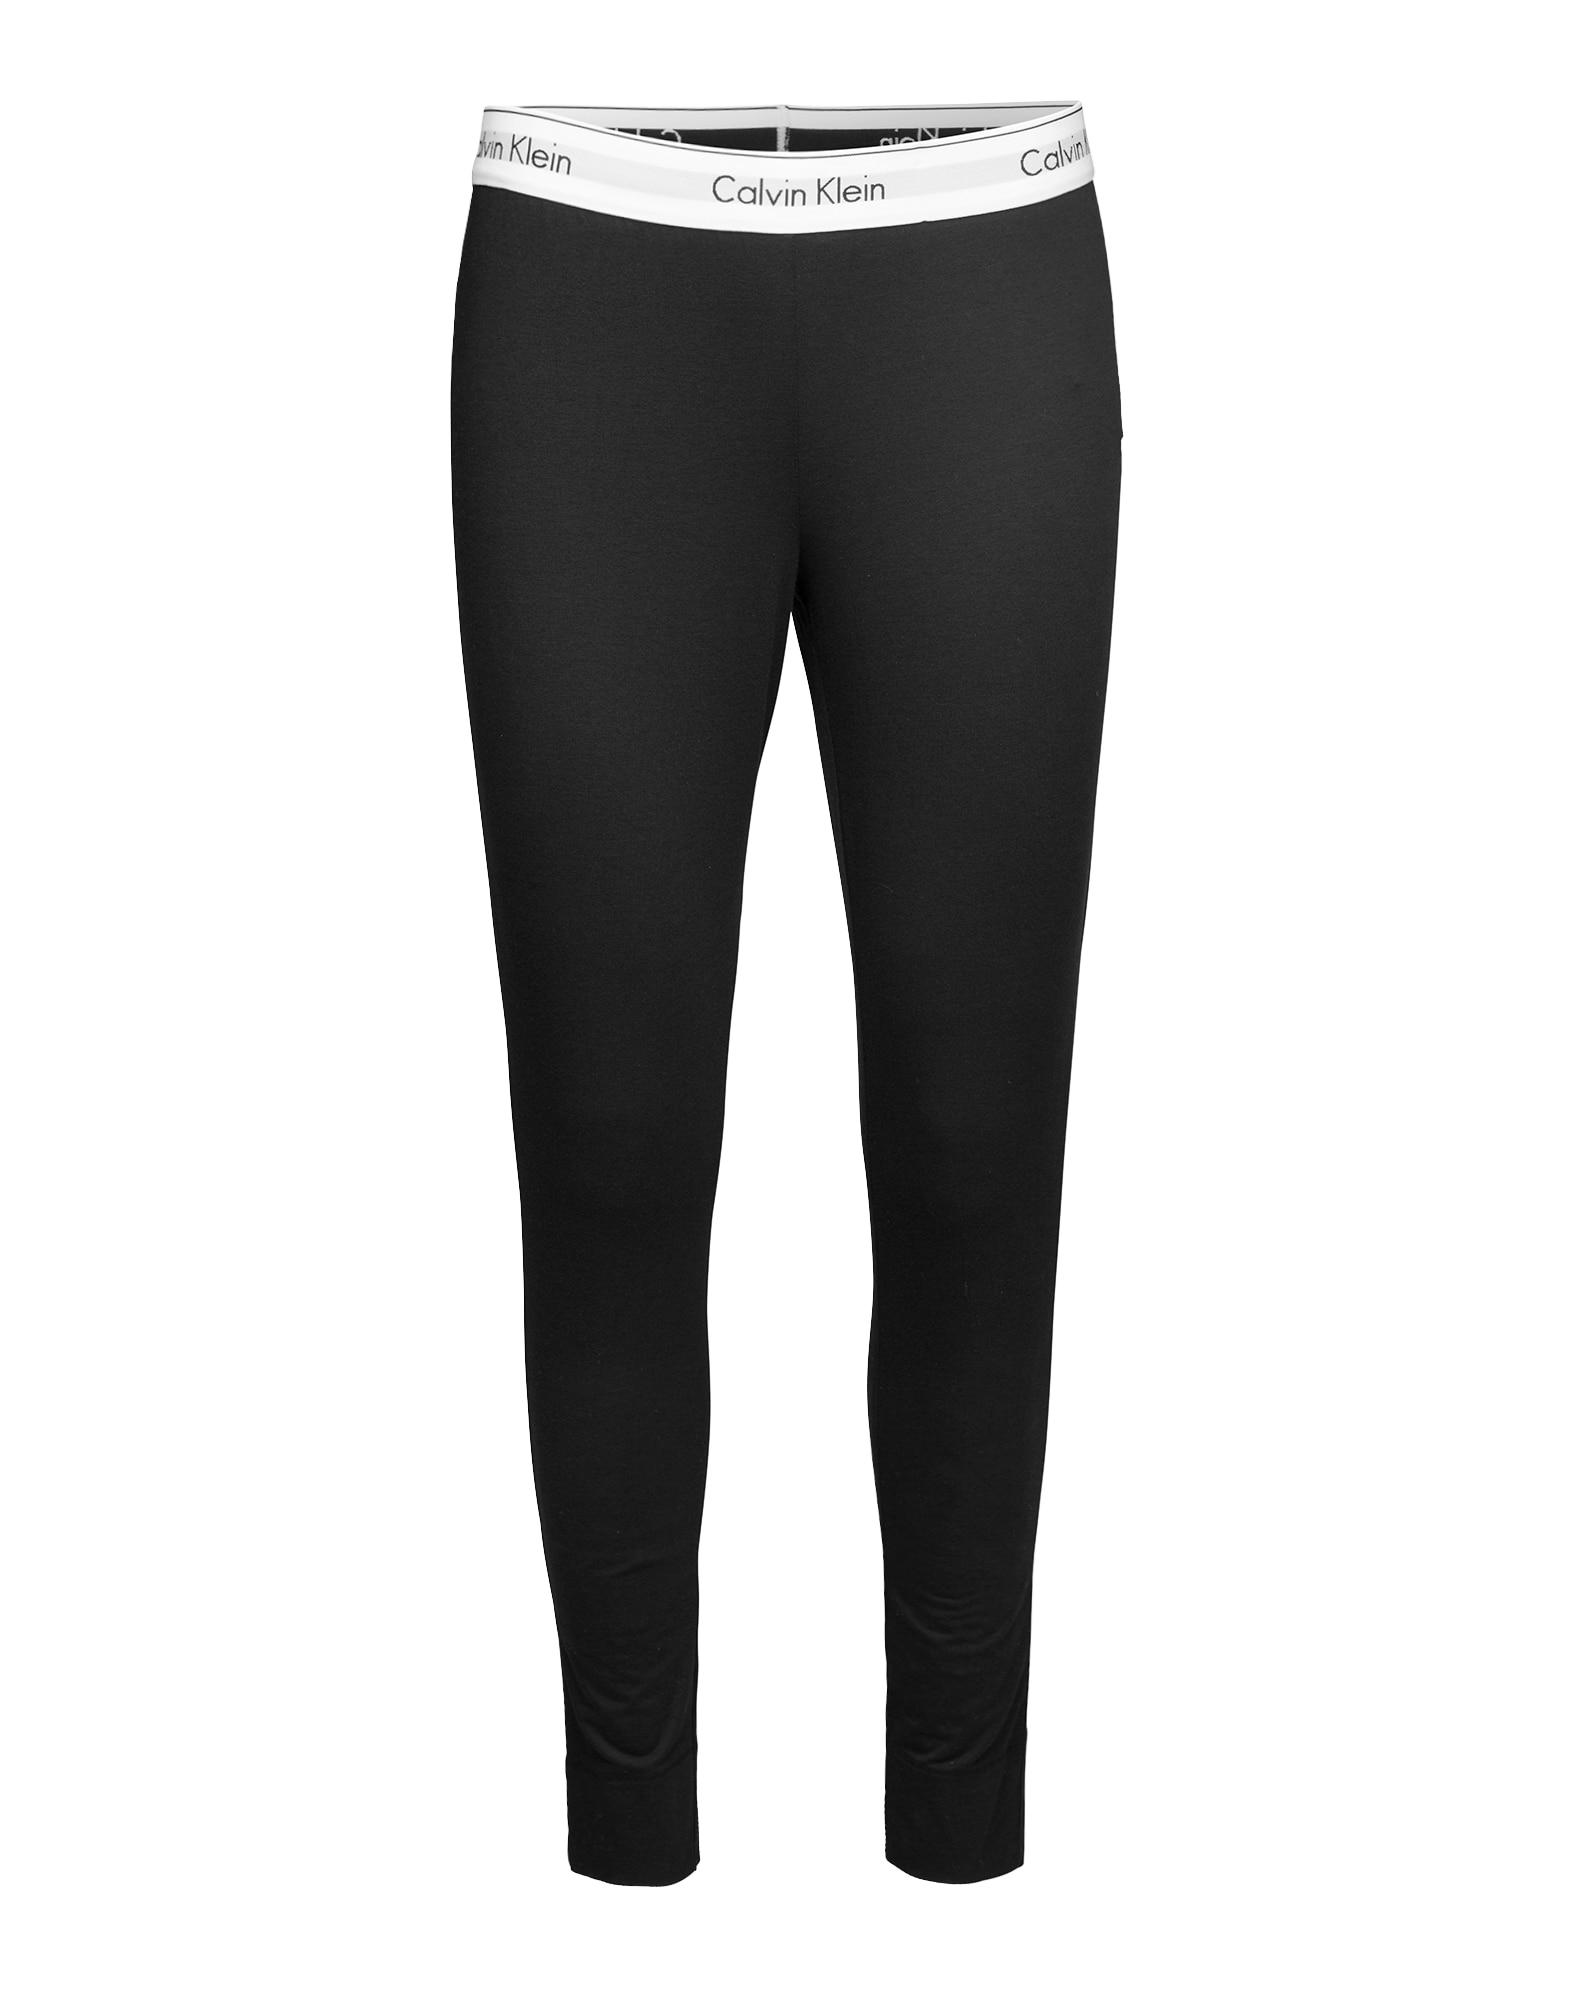 Homewear-Hose | Bekleidung > Homewear > Relaxhosen | Calvin Klein Underwear